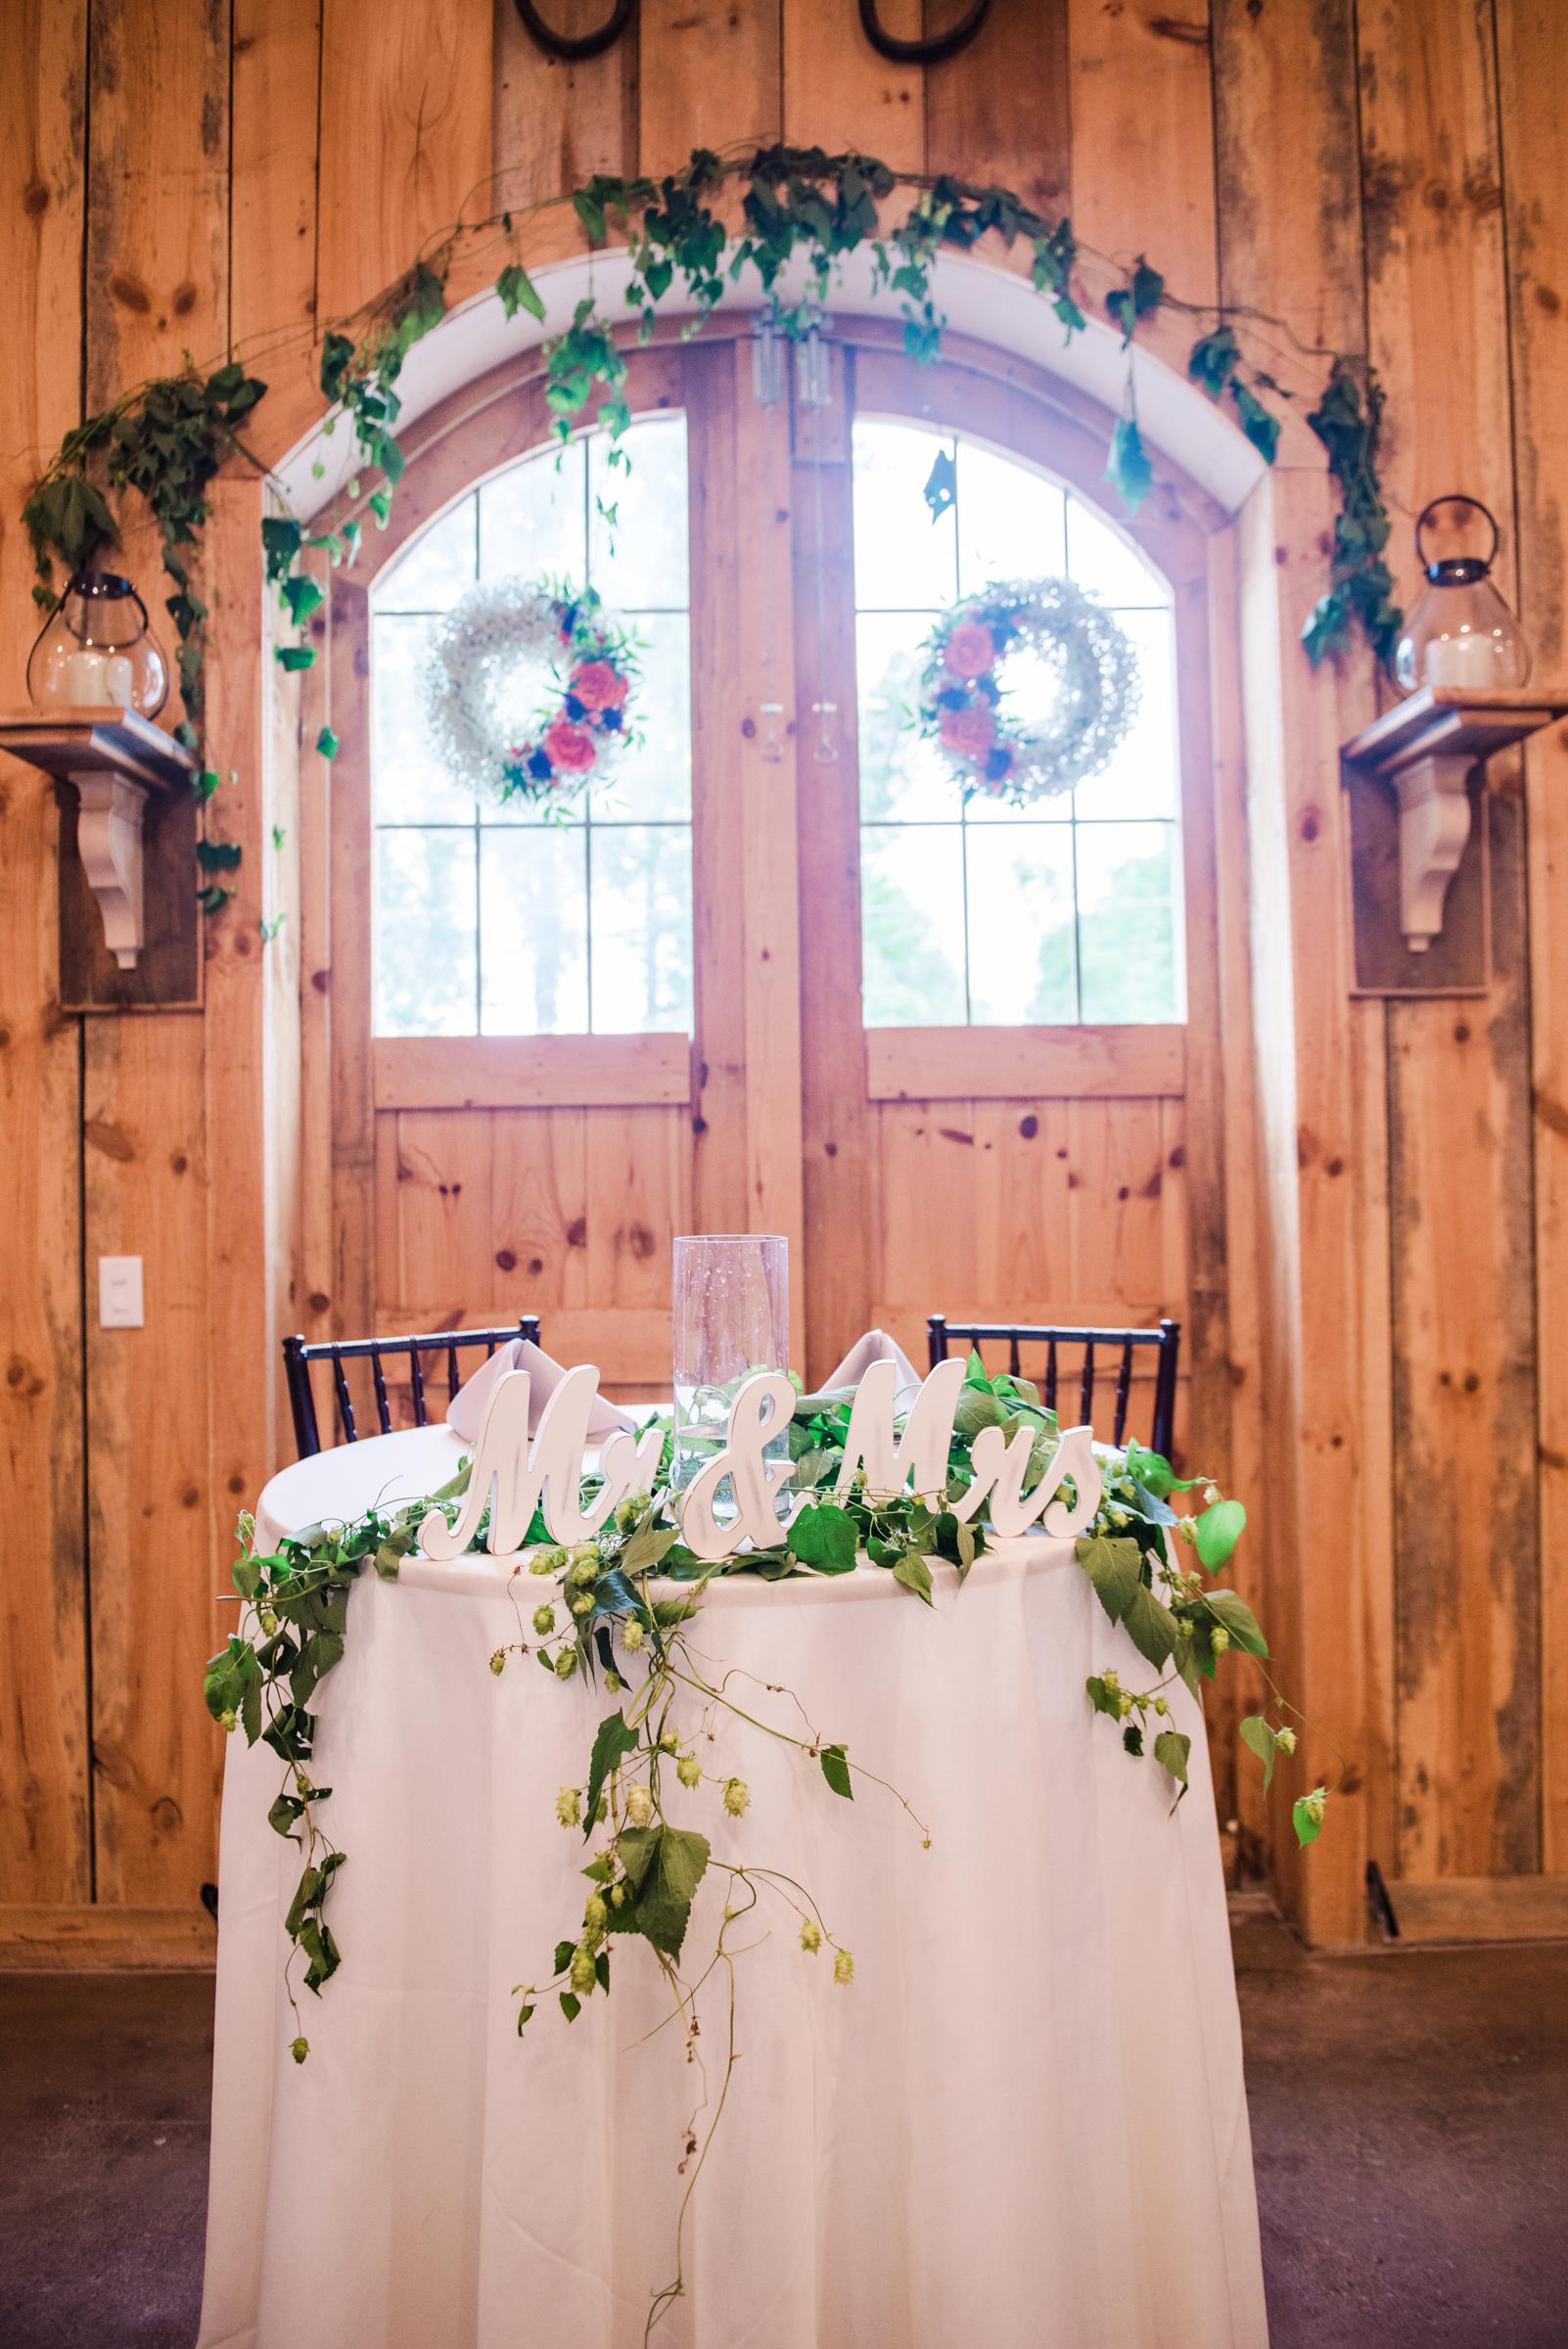 Wolf_Oak_Acres_Central_NY_Wedding_JILL_STUDIO_Rochester_NY_Photographer_DSC_8218.jpg